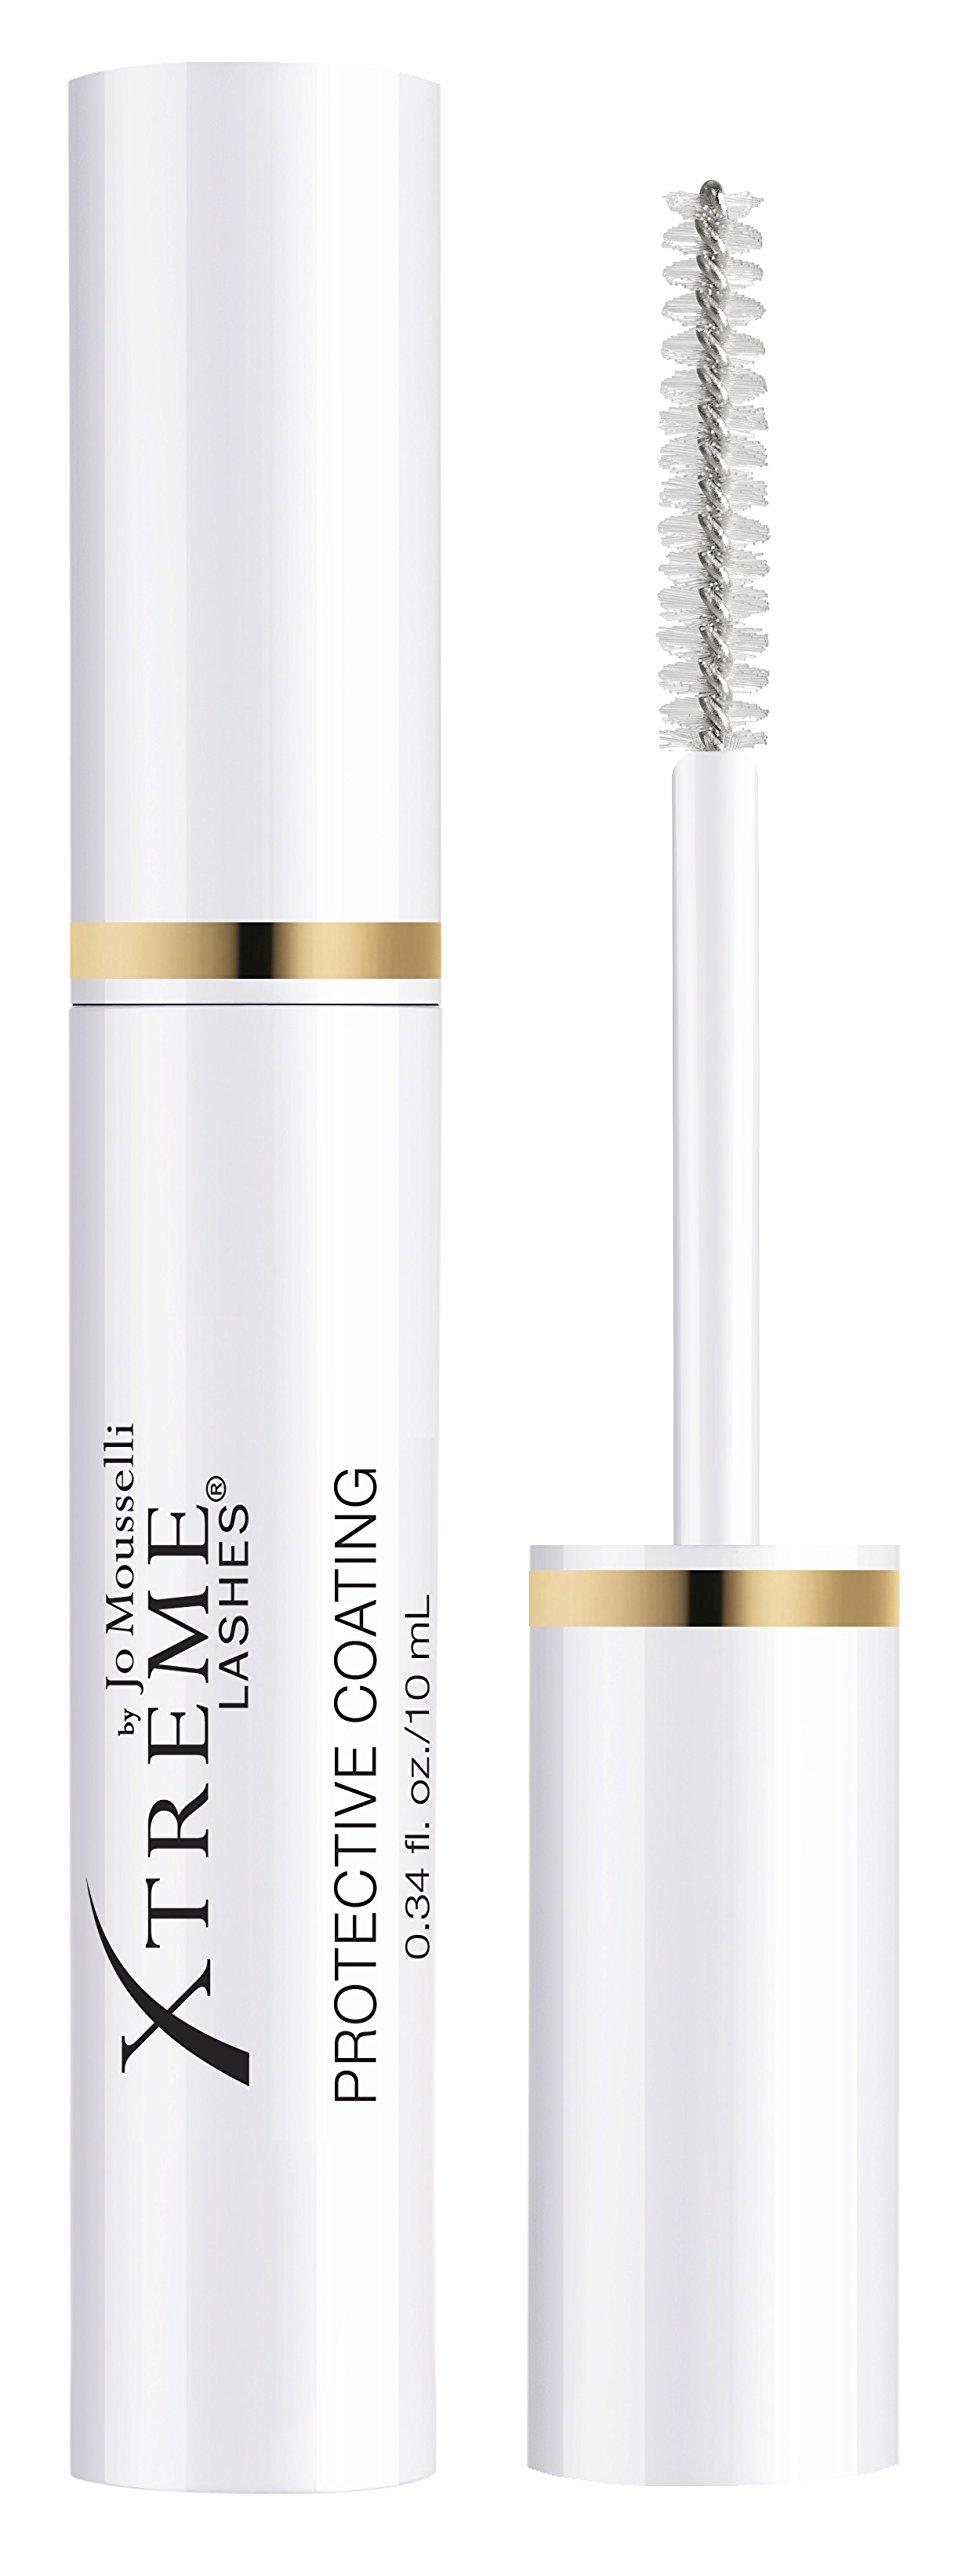 Xtreme Lashes Protective Coating for Eyelash Extensions